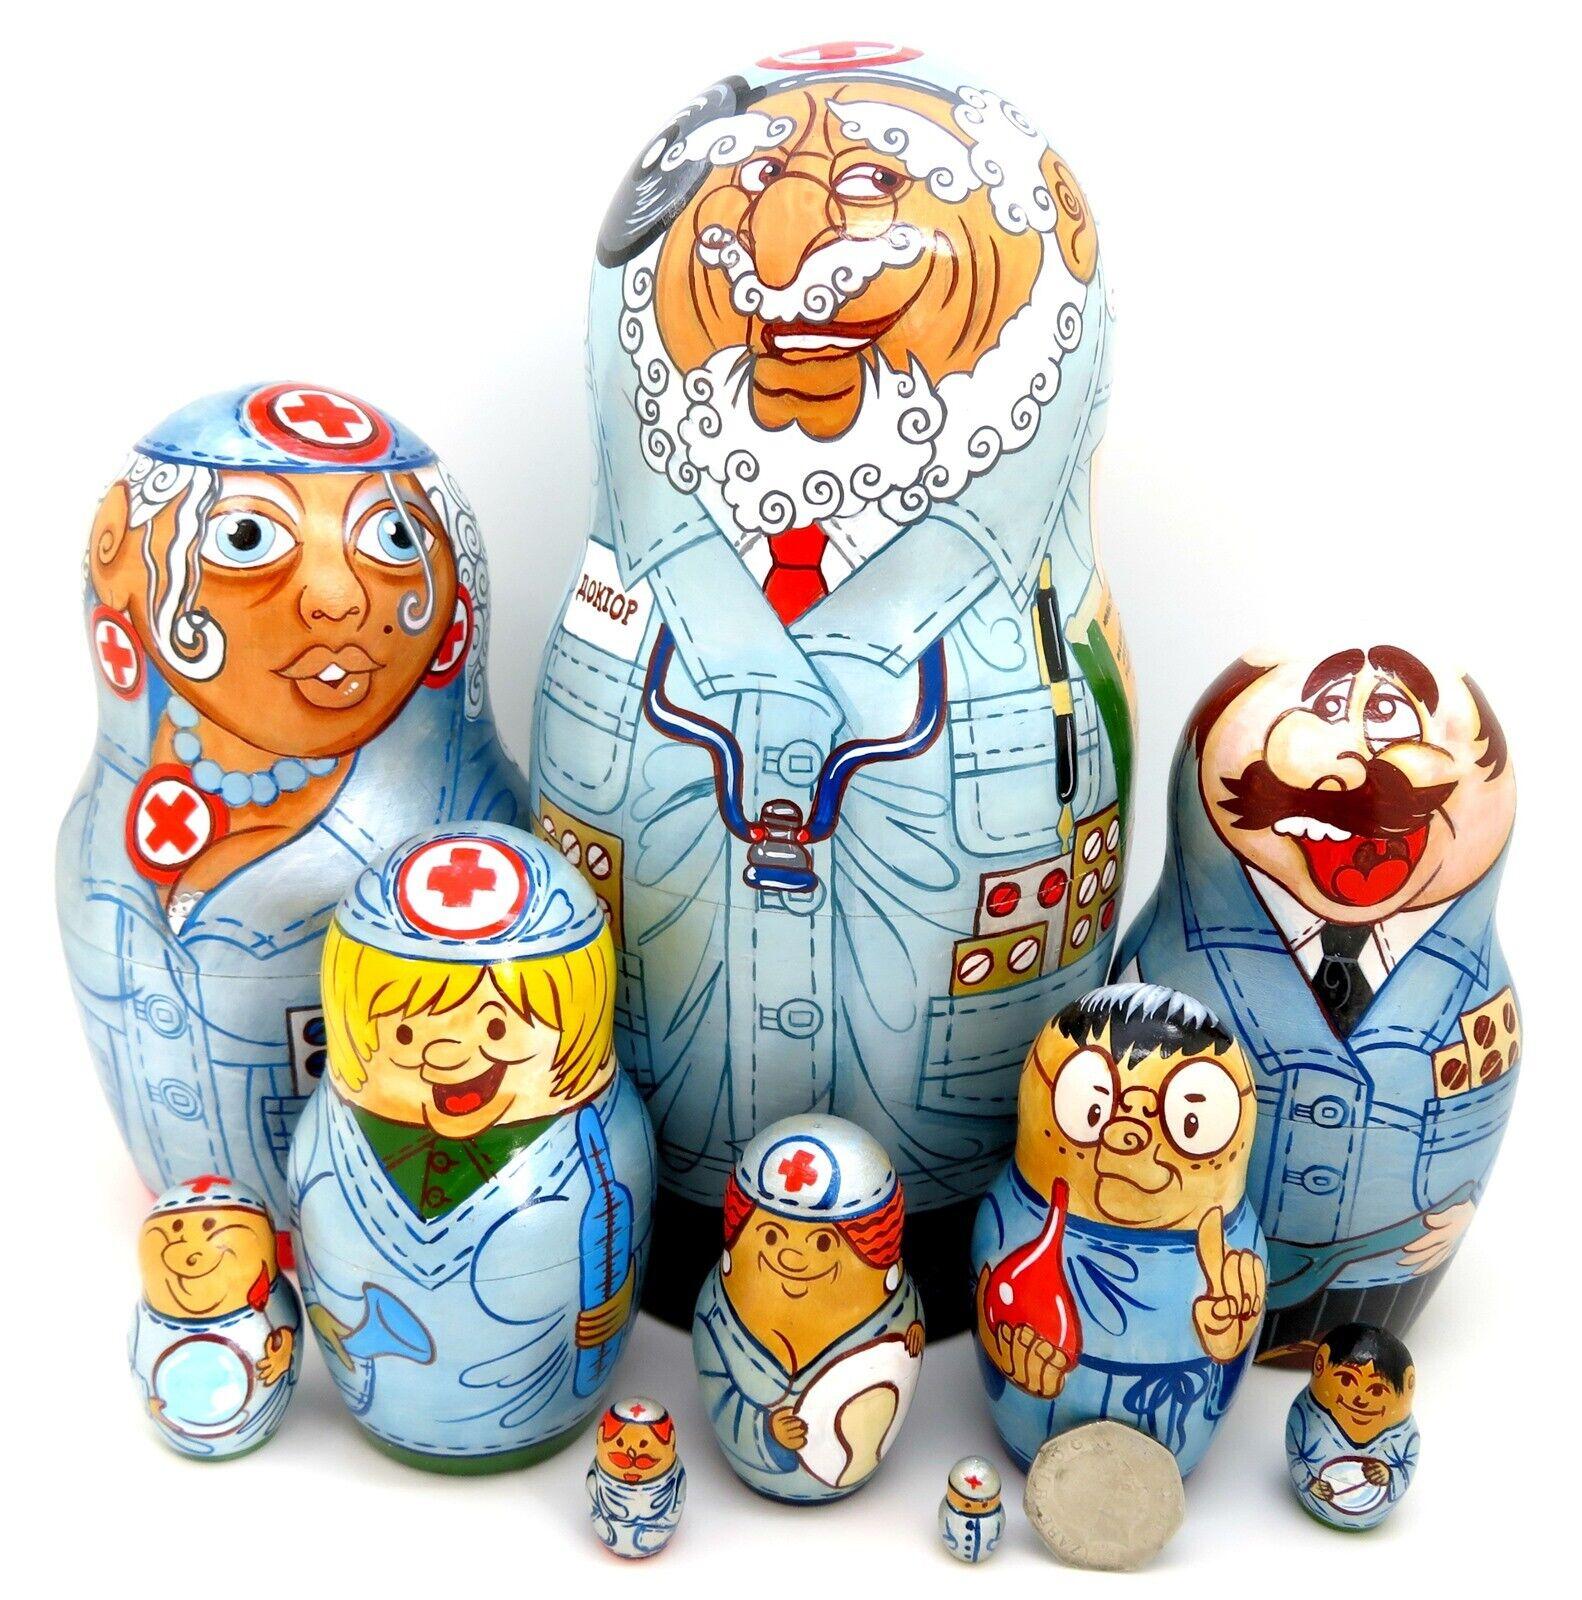 I Dottori & Infermiere MATRIOSCA bambole russe a matrioska 10 Diverdeenti Dottore Infermiera firmato